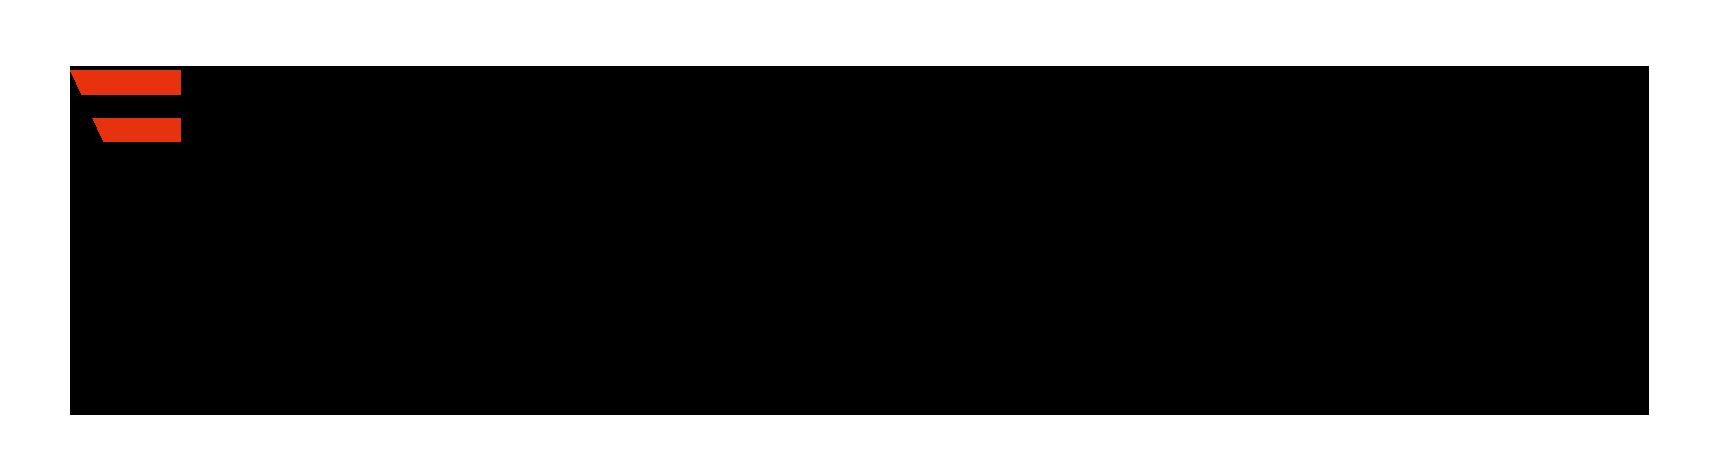 2021_BMKOES_Logo_srgb